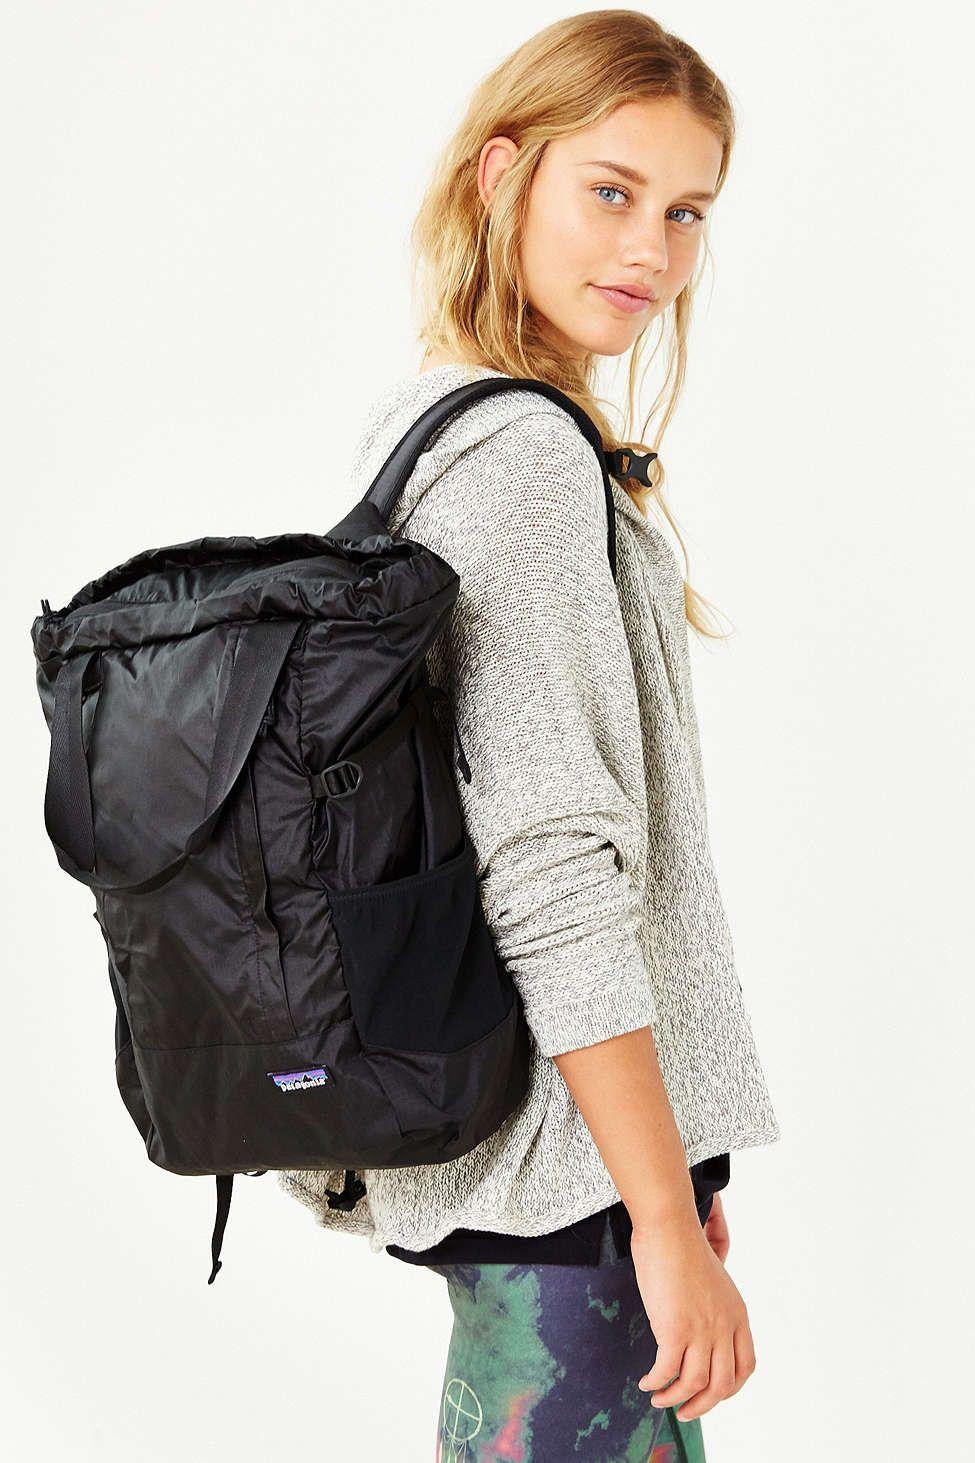 Patagonia Lightweight Travel Tote Bag Bags Backpack